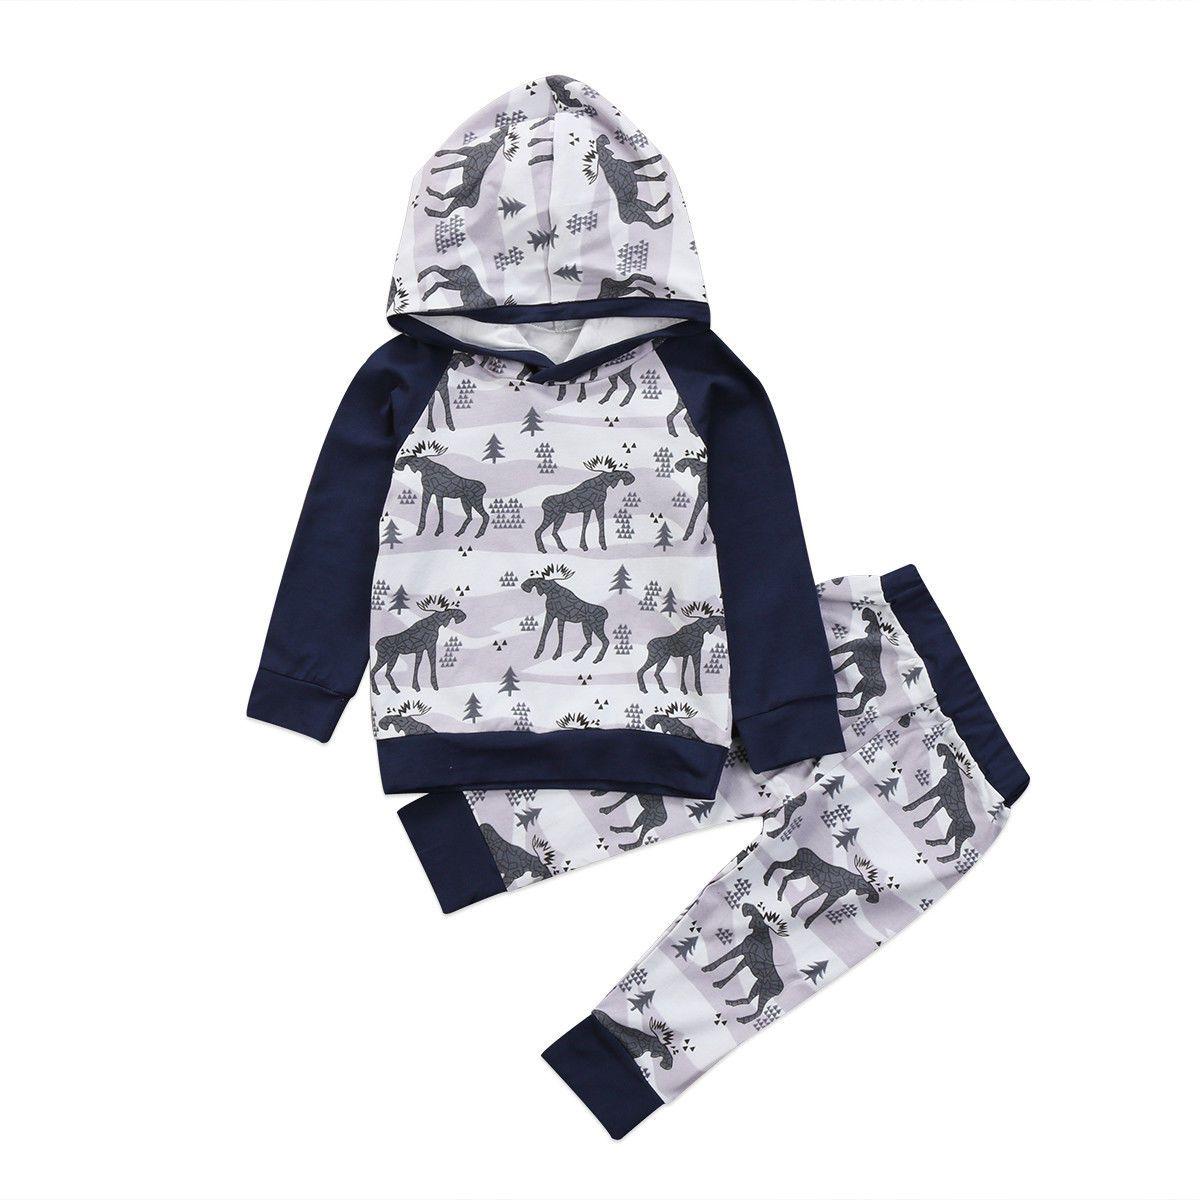 38e364cae Christmas Baby Boys Long Sleeve T-shirt Pants Leggings Outfits 2PCS Clothes  Set Warm Winter Hooded Coat 0-24M #ChristmasOutfit